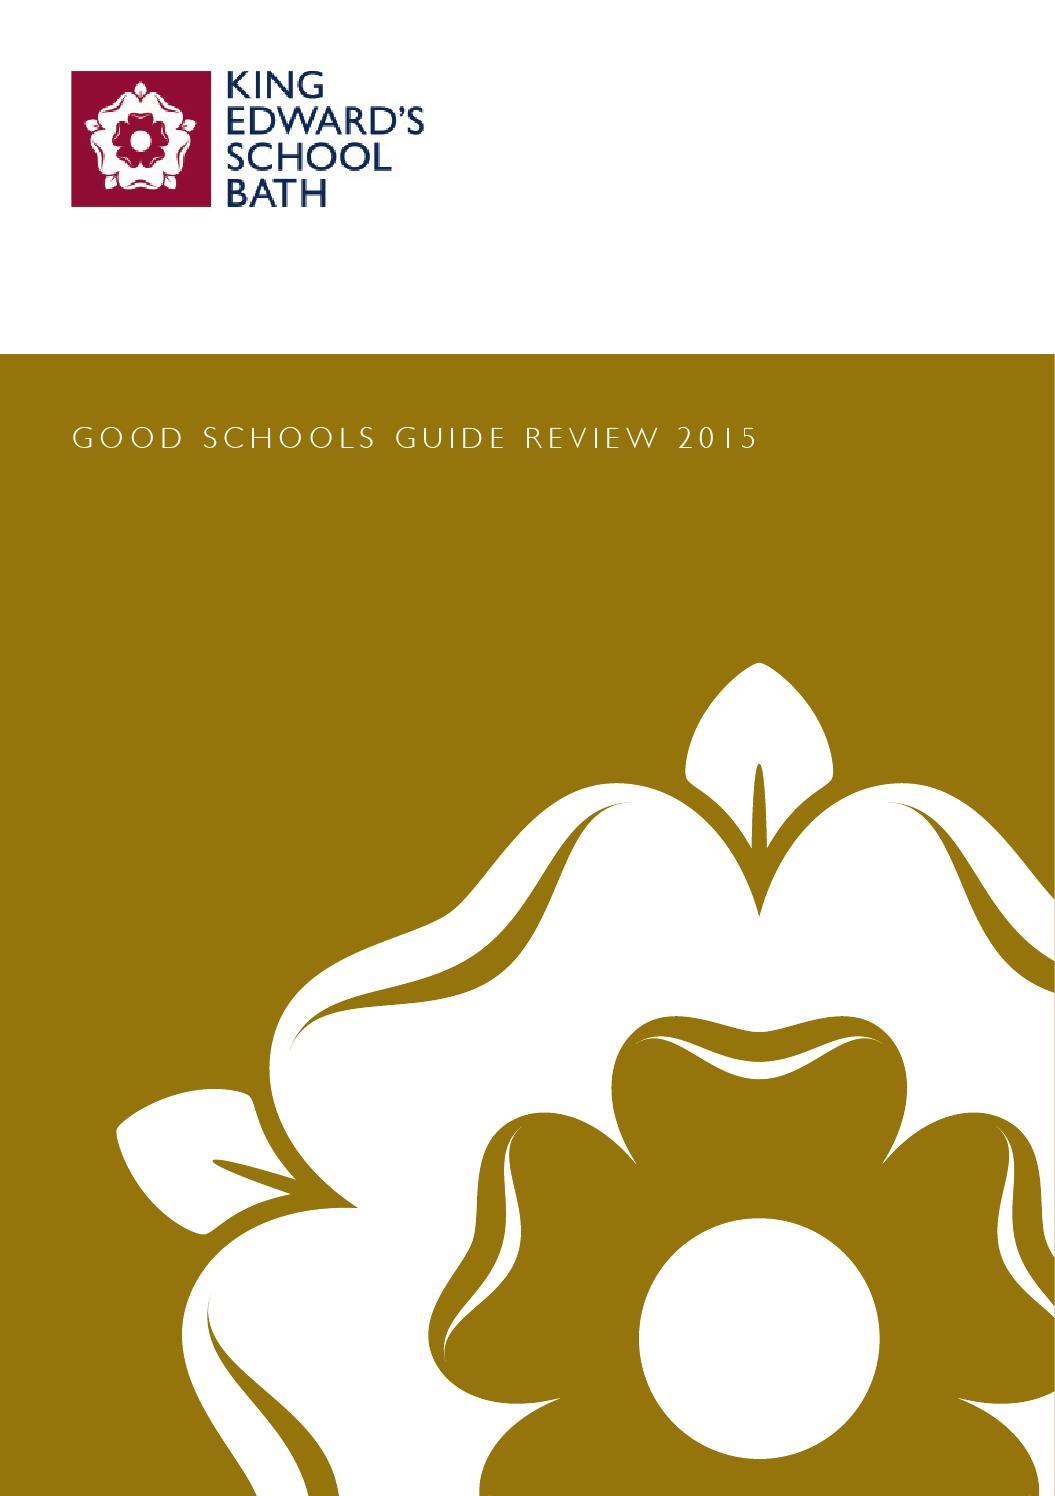 Bath 10 cents clipart svg transparent King Edward\'s School Good Schools Guide Review 2015 by King Edward\'s ... svg transparent